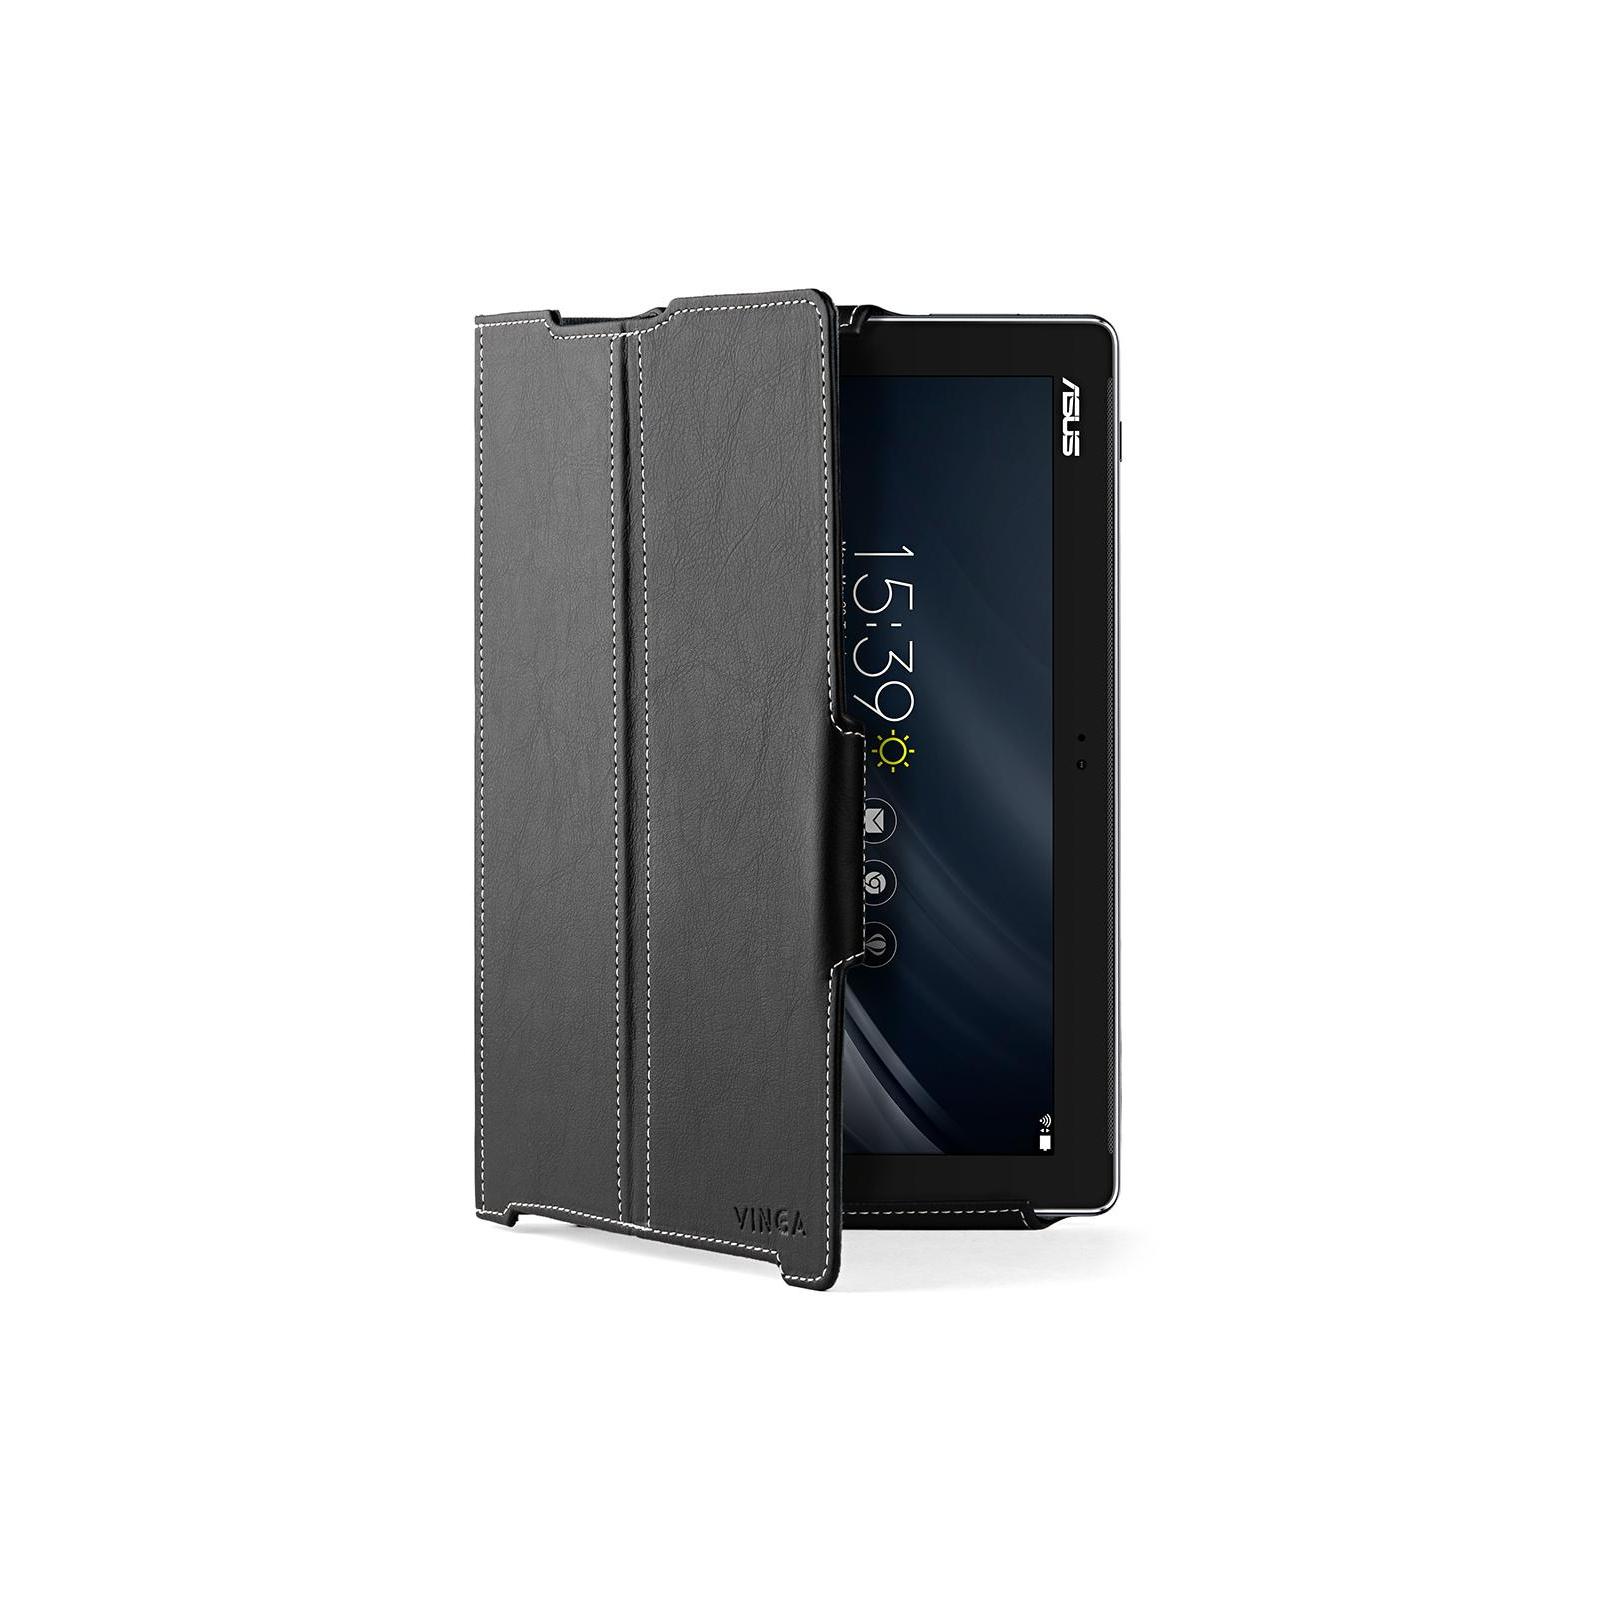 Чехол для планшета ASUS ZenPad 10 Z301 black Vinga (VNZP301MFL)